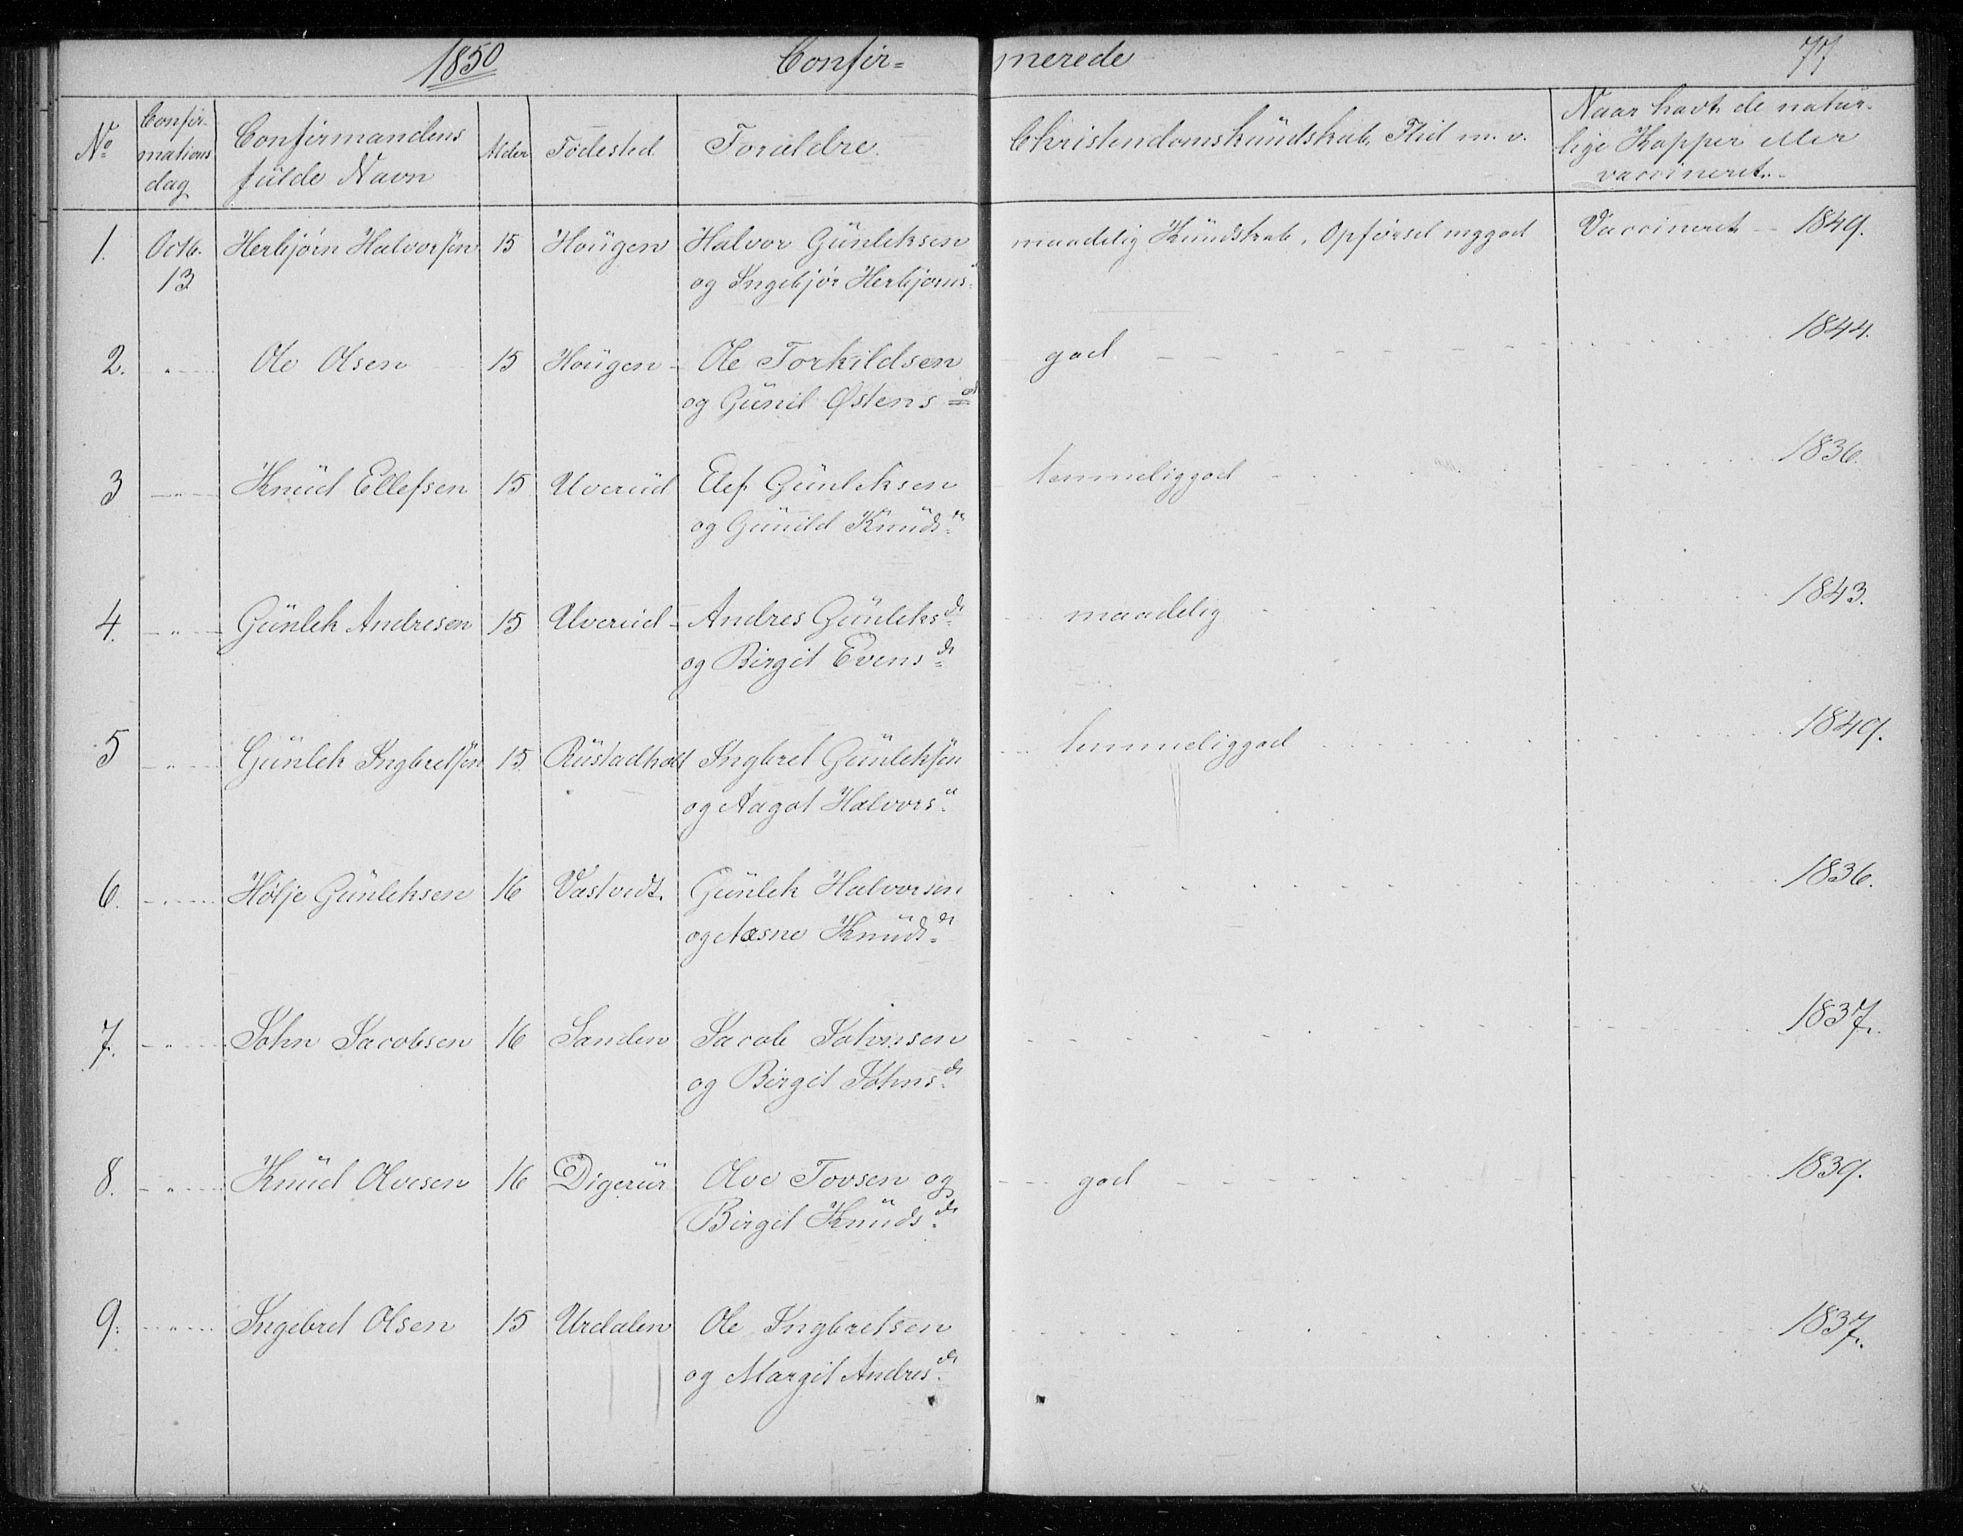 SAKO, Gransherad kirkebøker, F/Fb/L0003: Ministerialbok nr. II 3, 1844-1859, s. 77